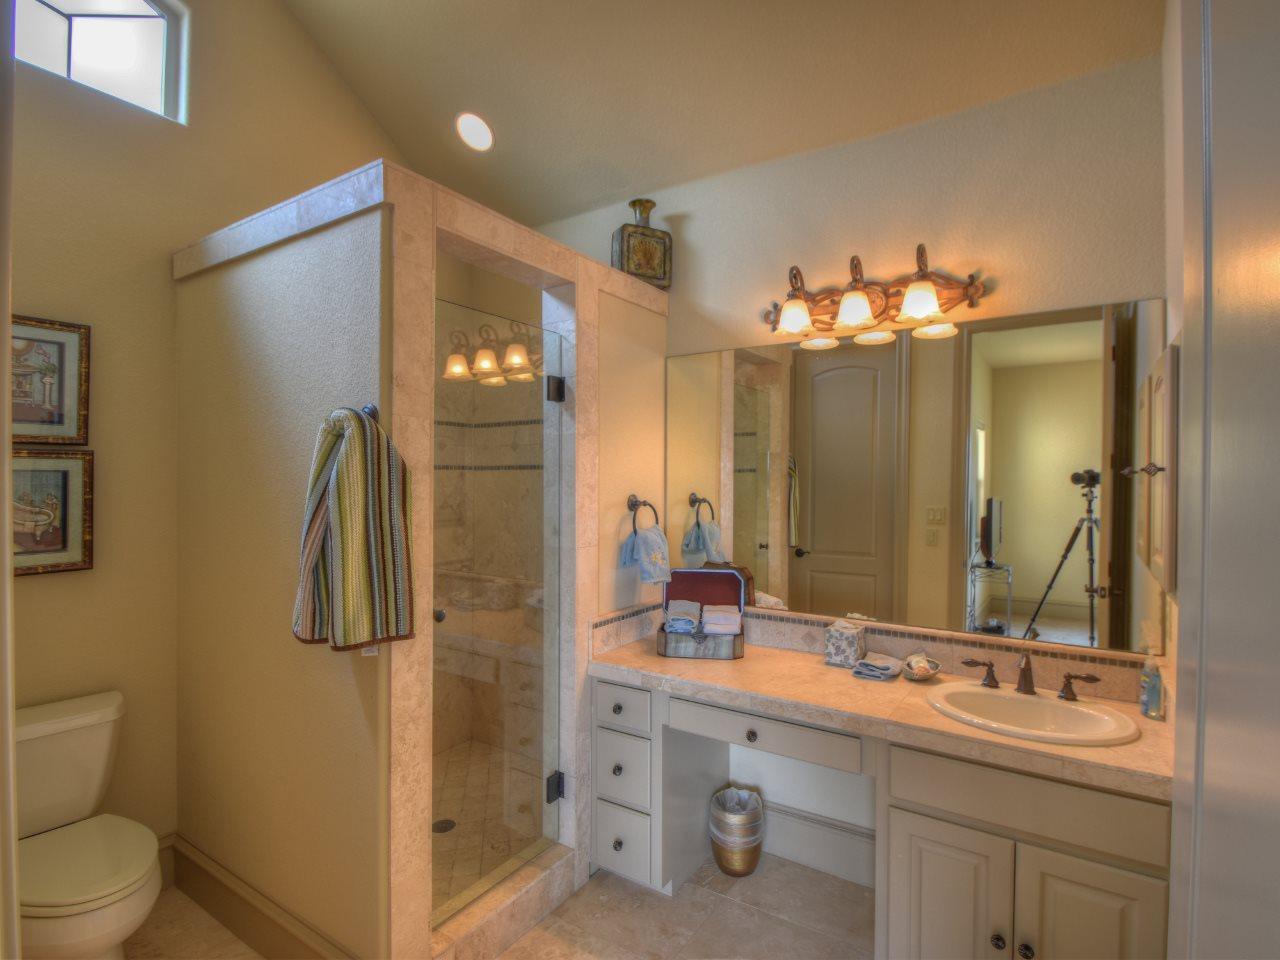 Additional photo for property listing at 2518 Diagonal 2518 Diagonal Horseshoe Bay, Texas 78657 Estados Unidos